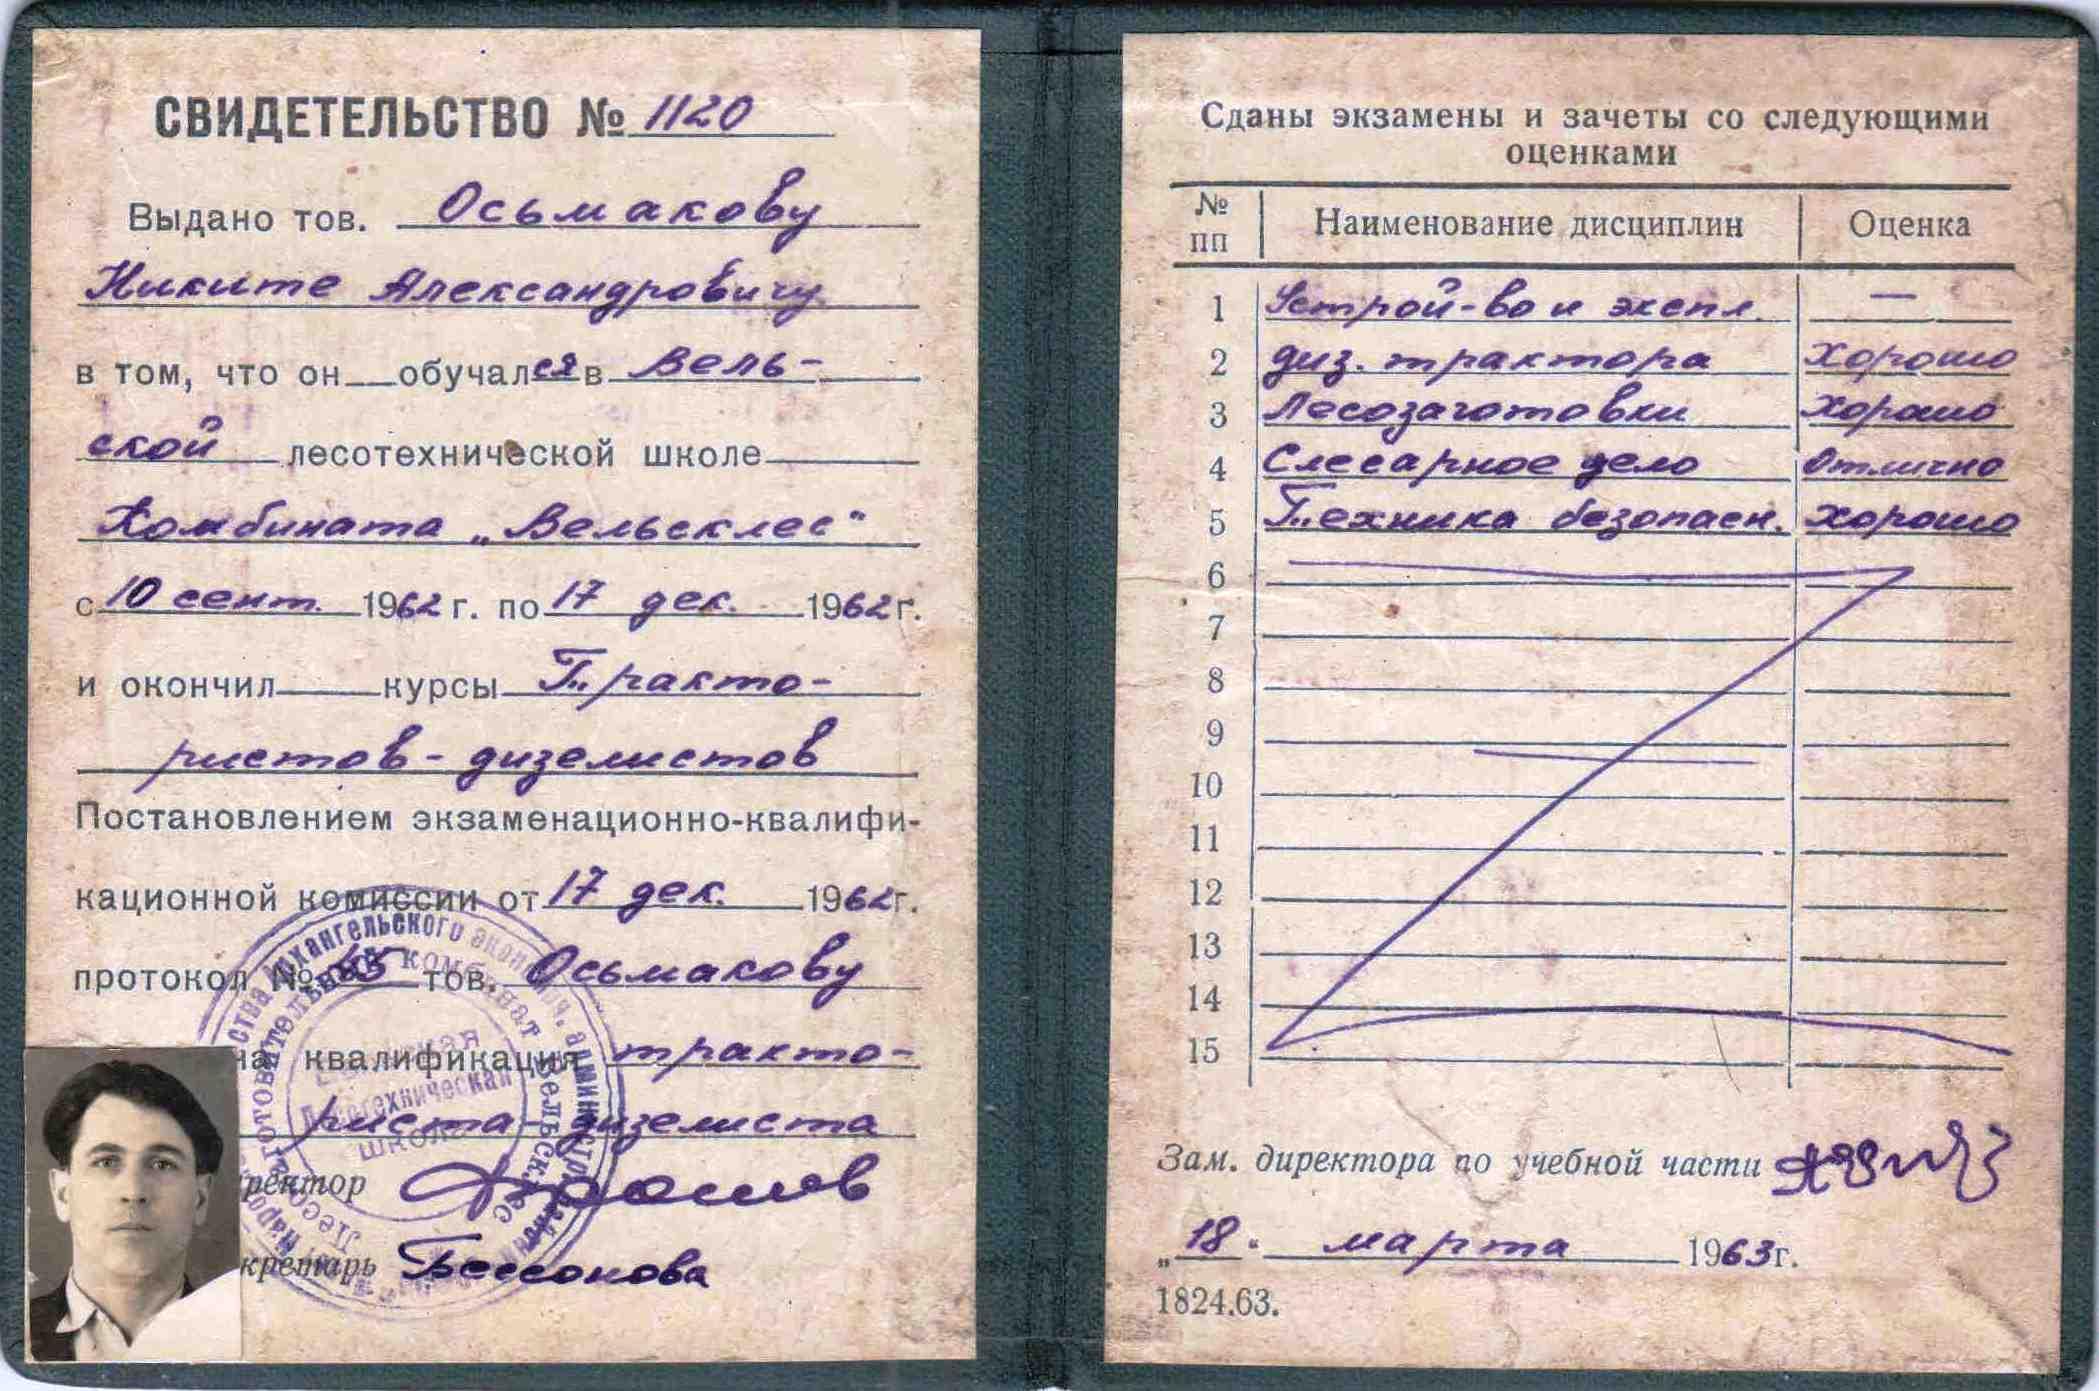 22. Свидетельство тракториста-дизелиста, 1962